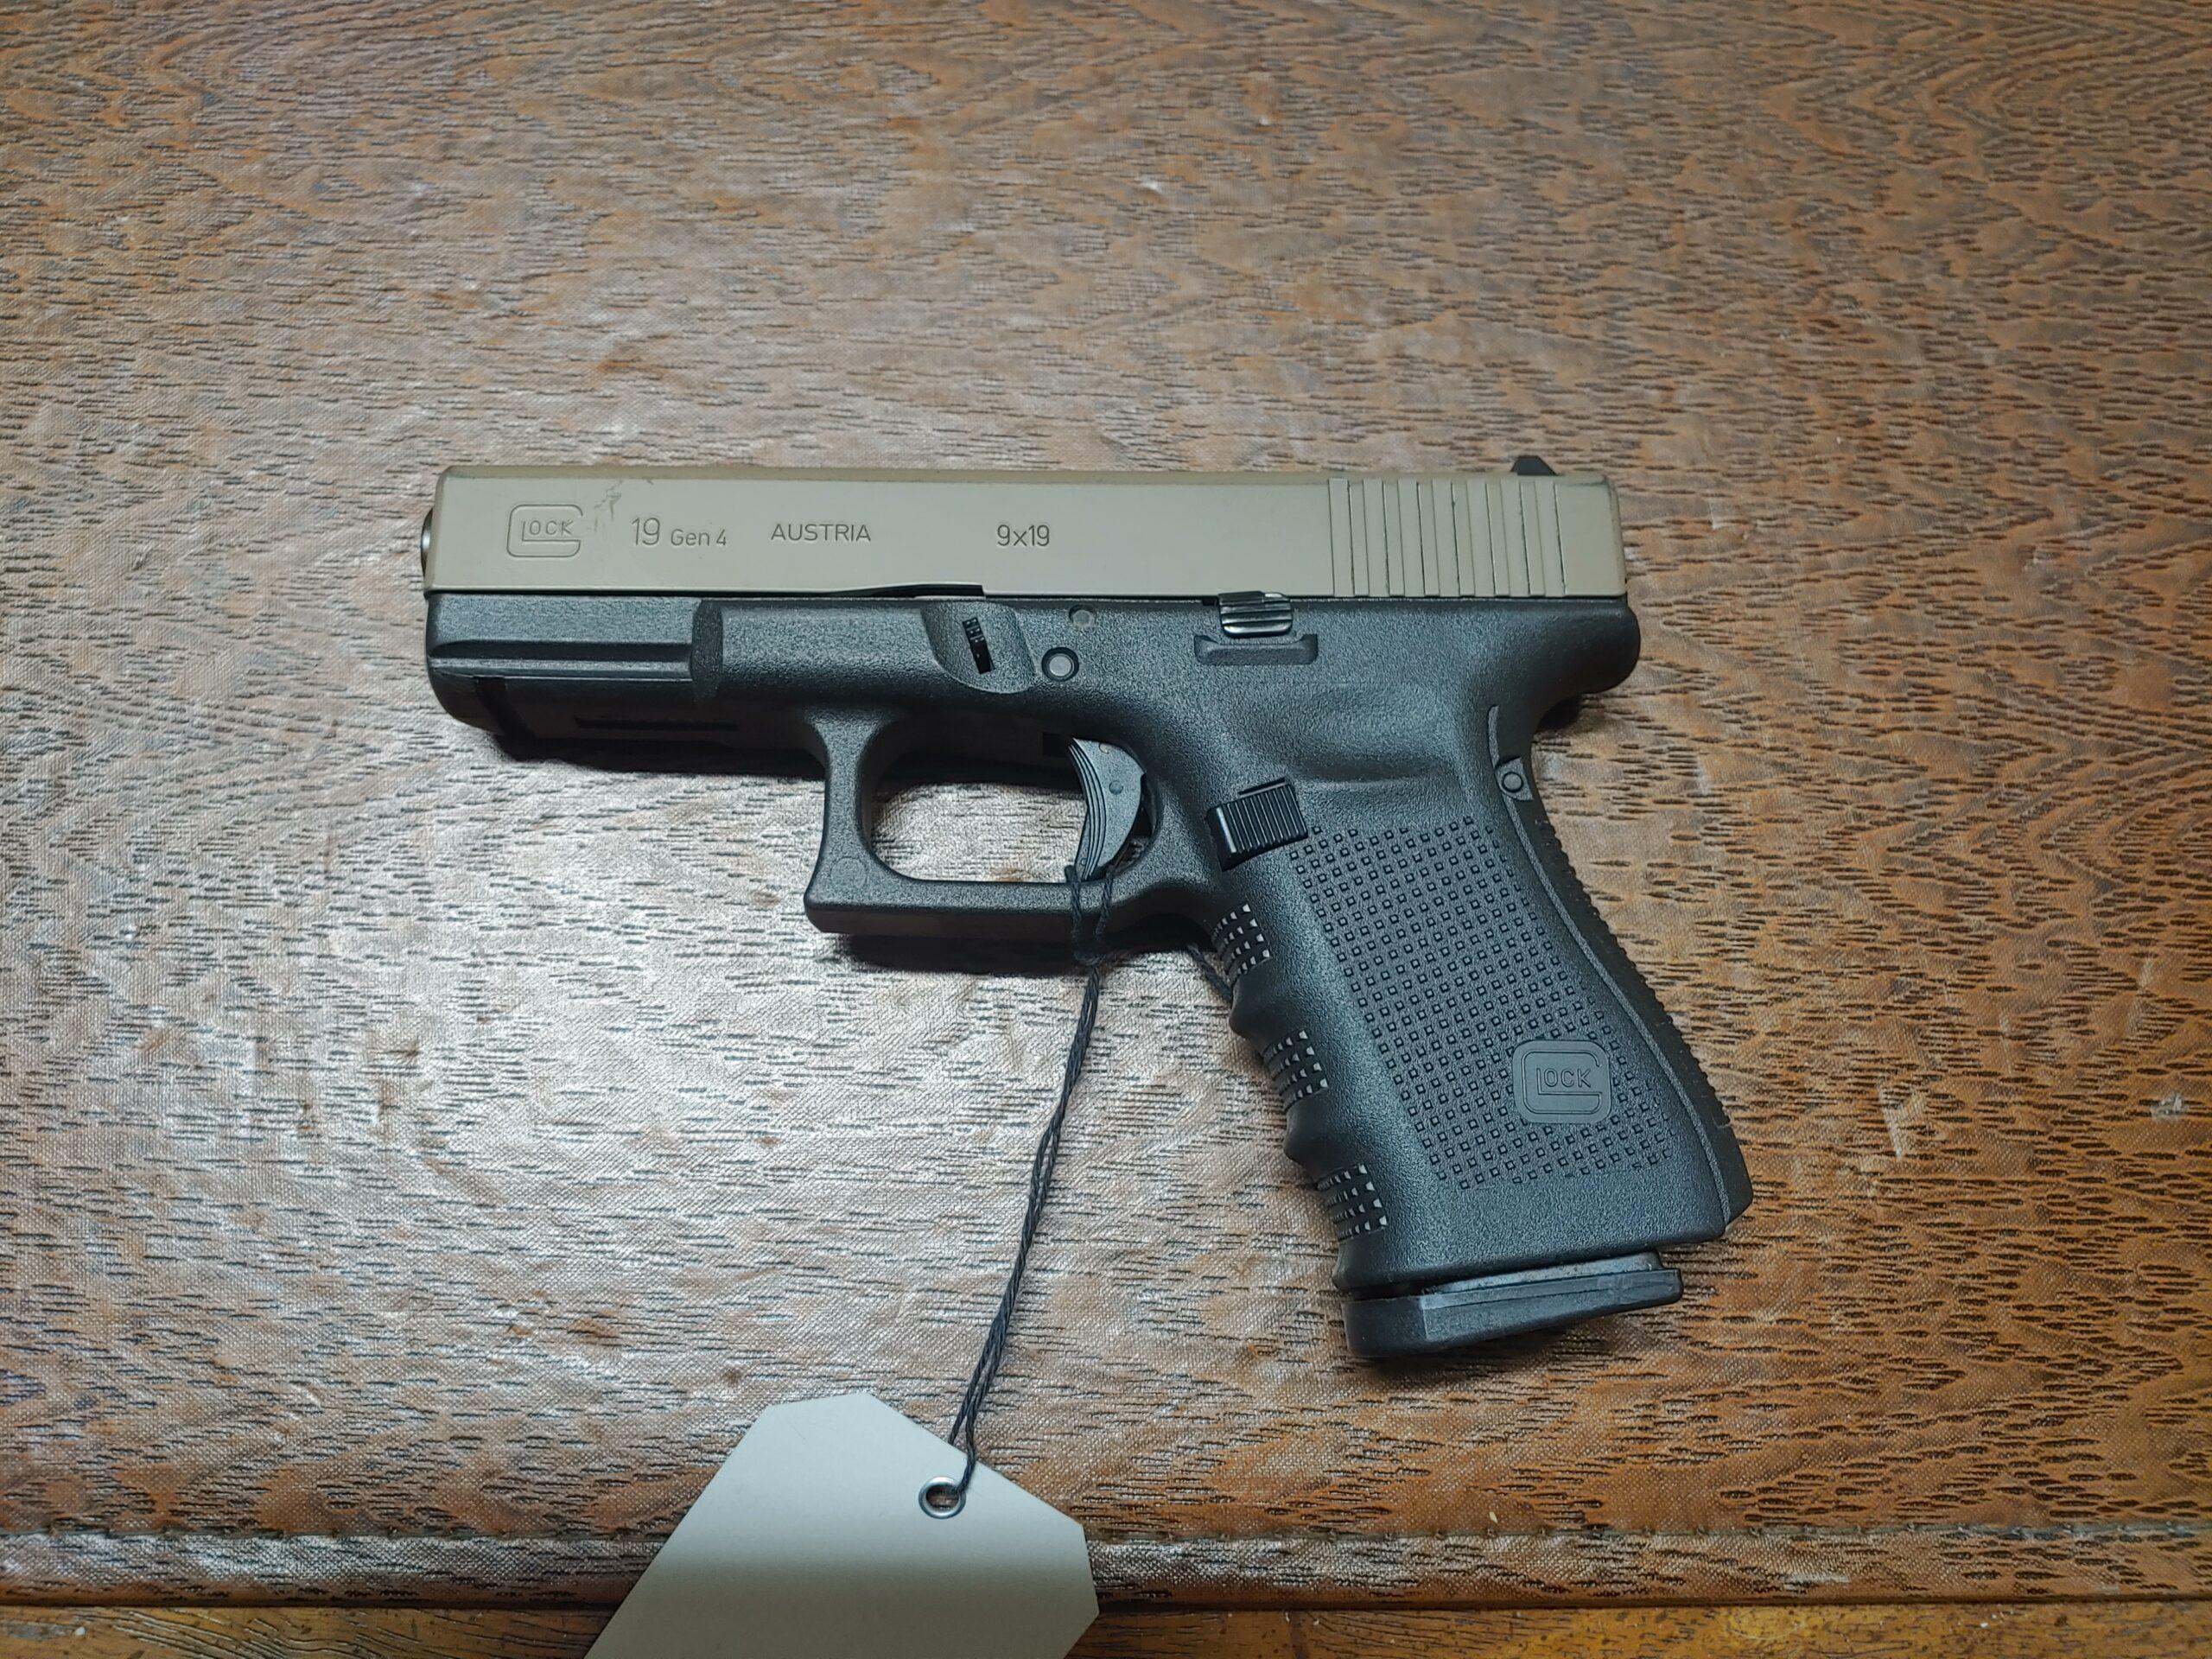 Glock 19 Gen4 9mm